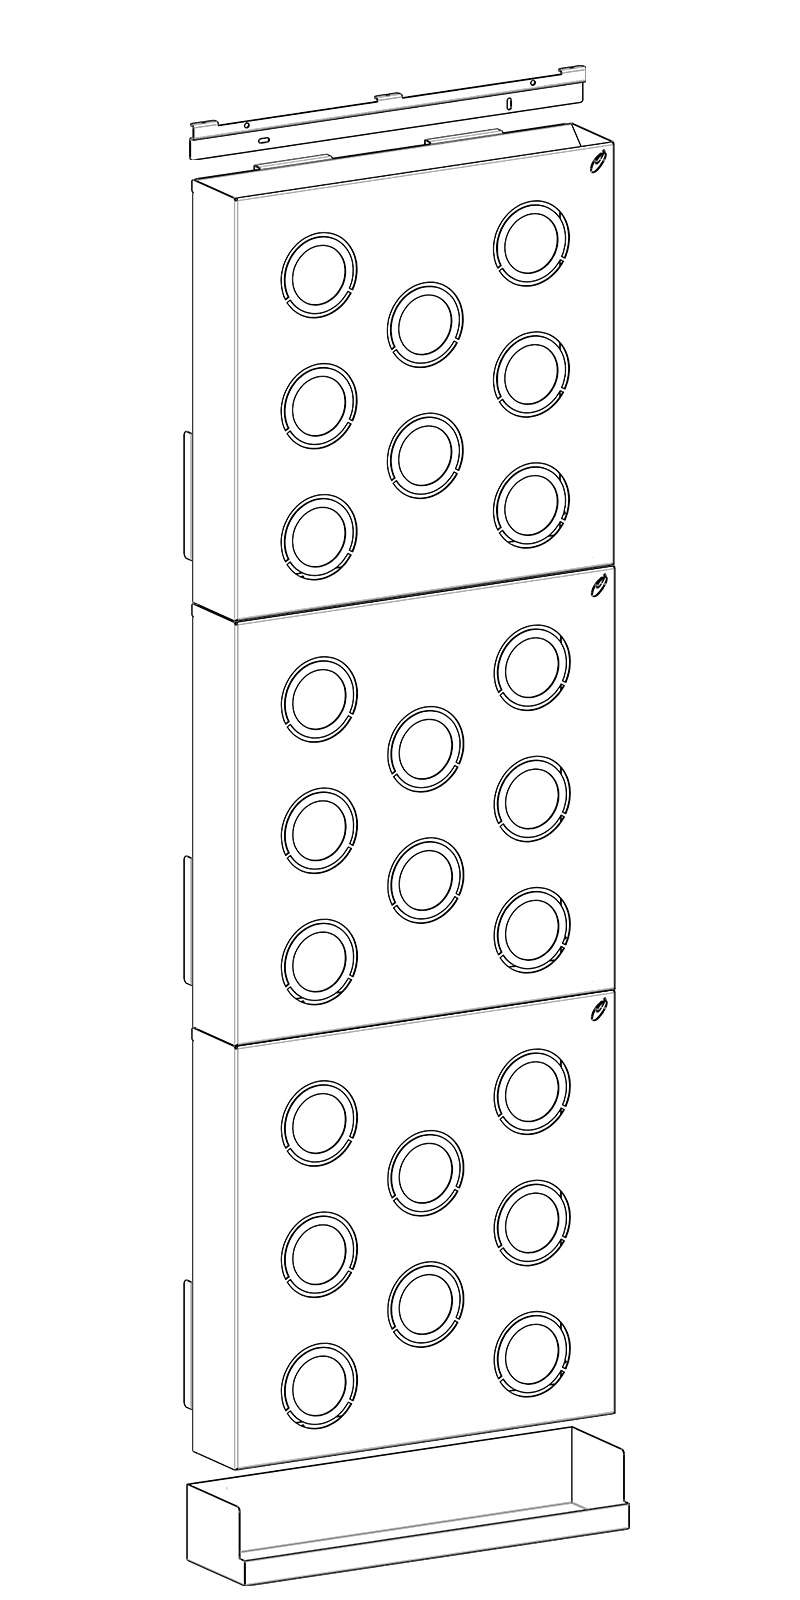 Tre HUB in verticale piùvaschetta larga 50,4 cm.